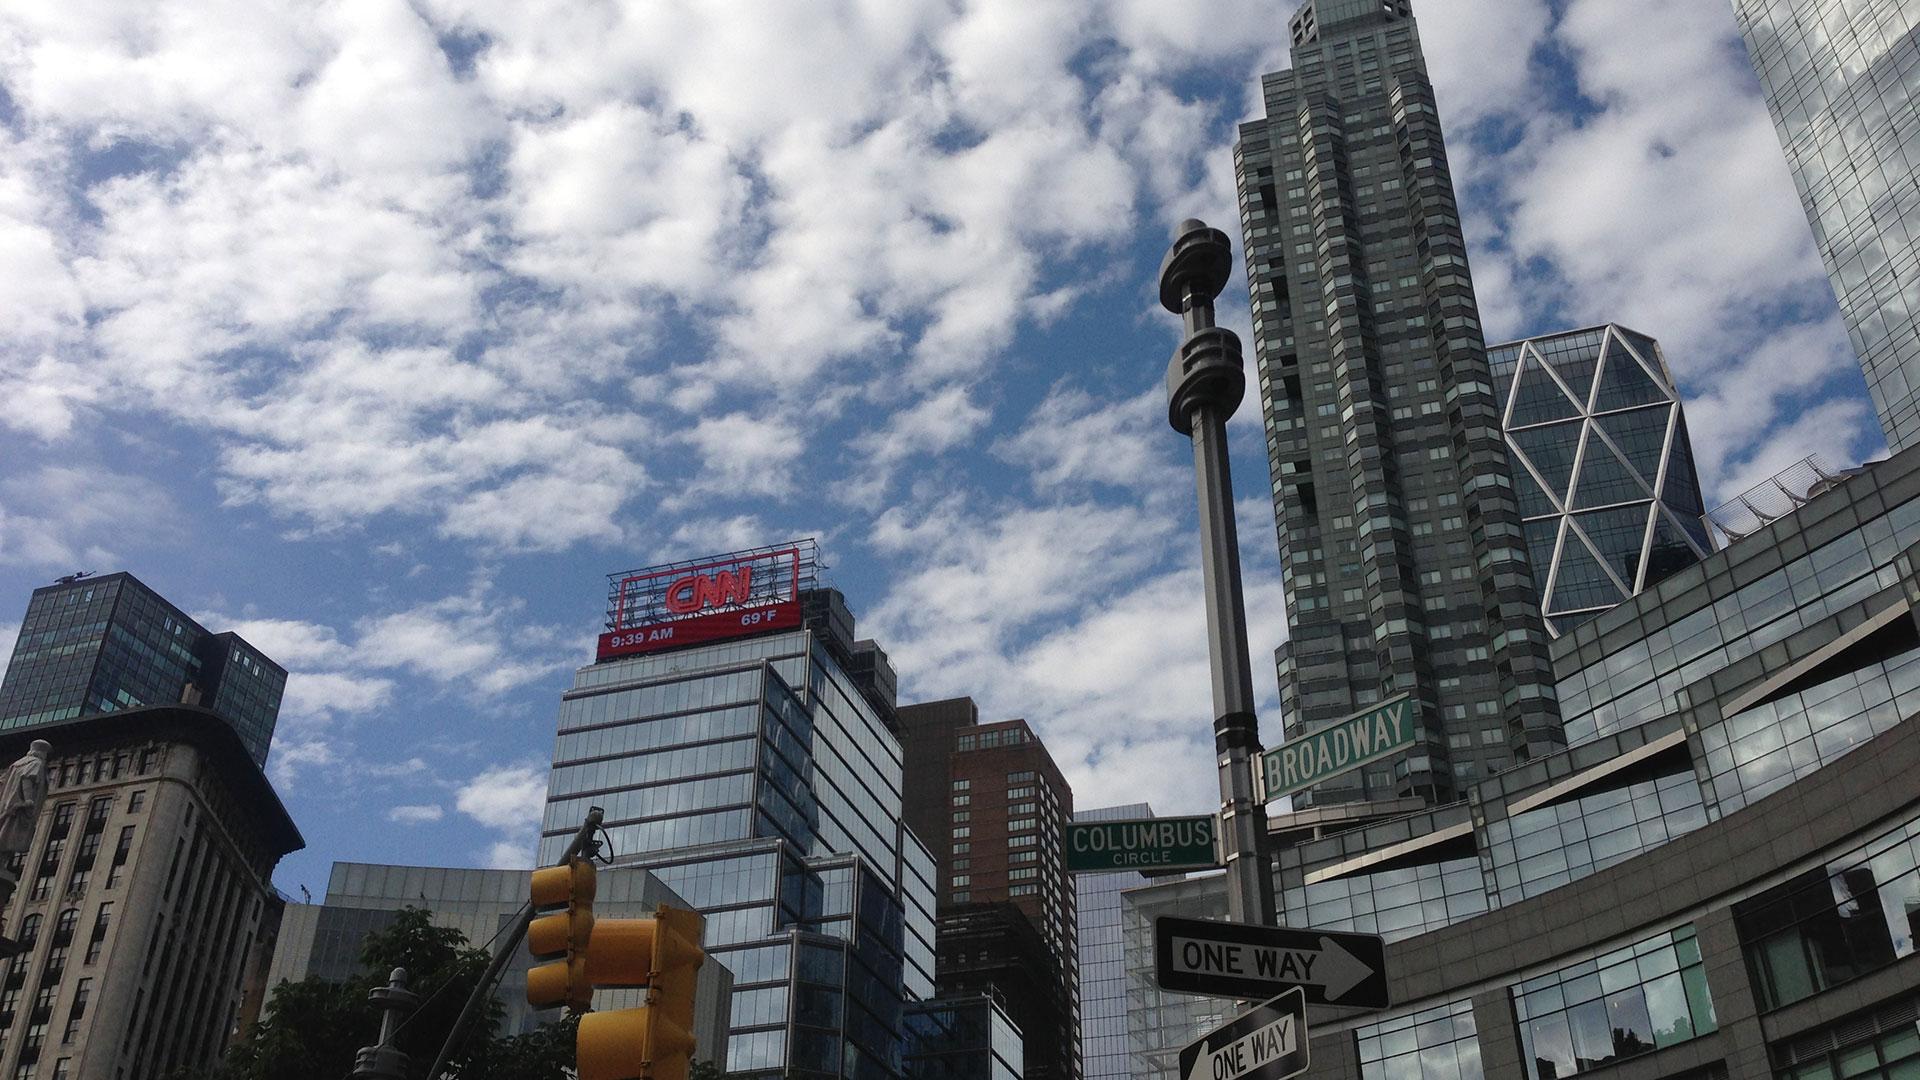 Cityscape: CNN Building